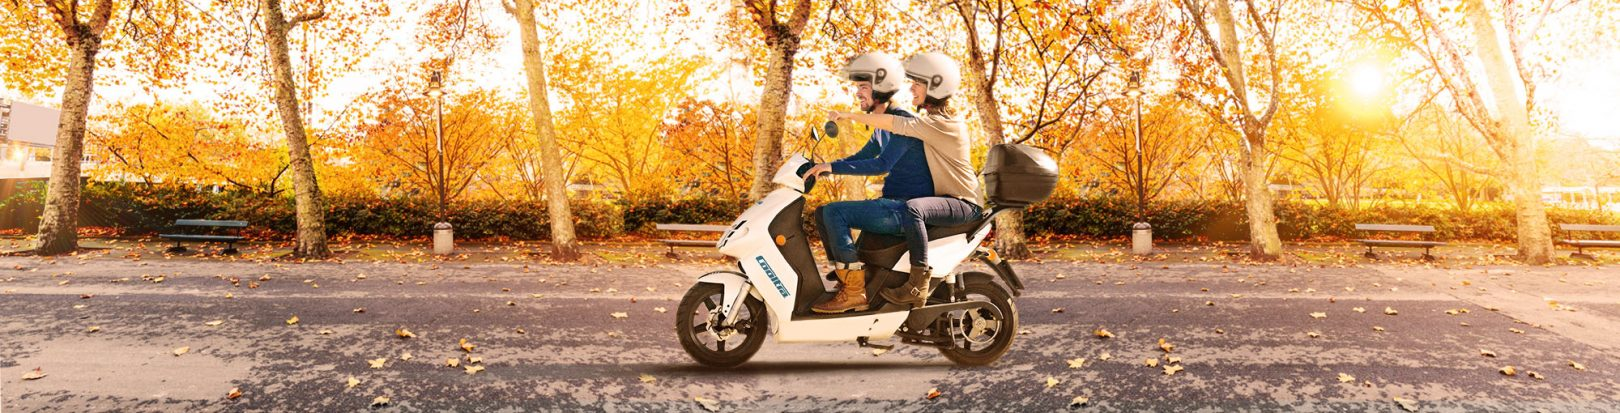 cooltra noleggio scooter moto